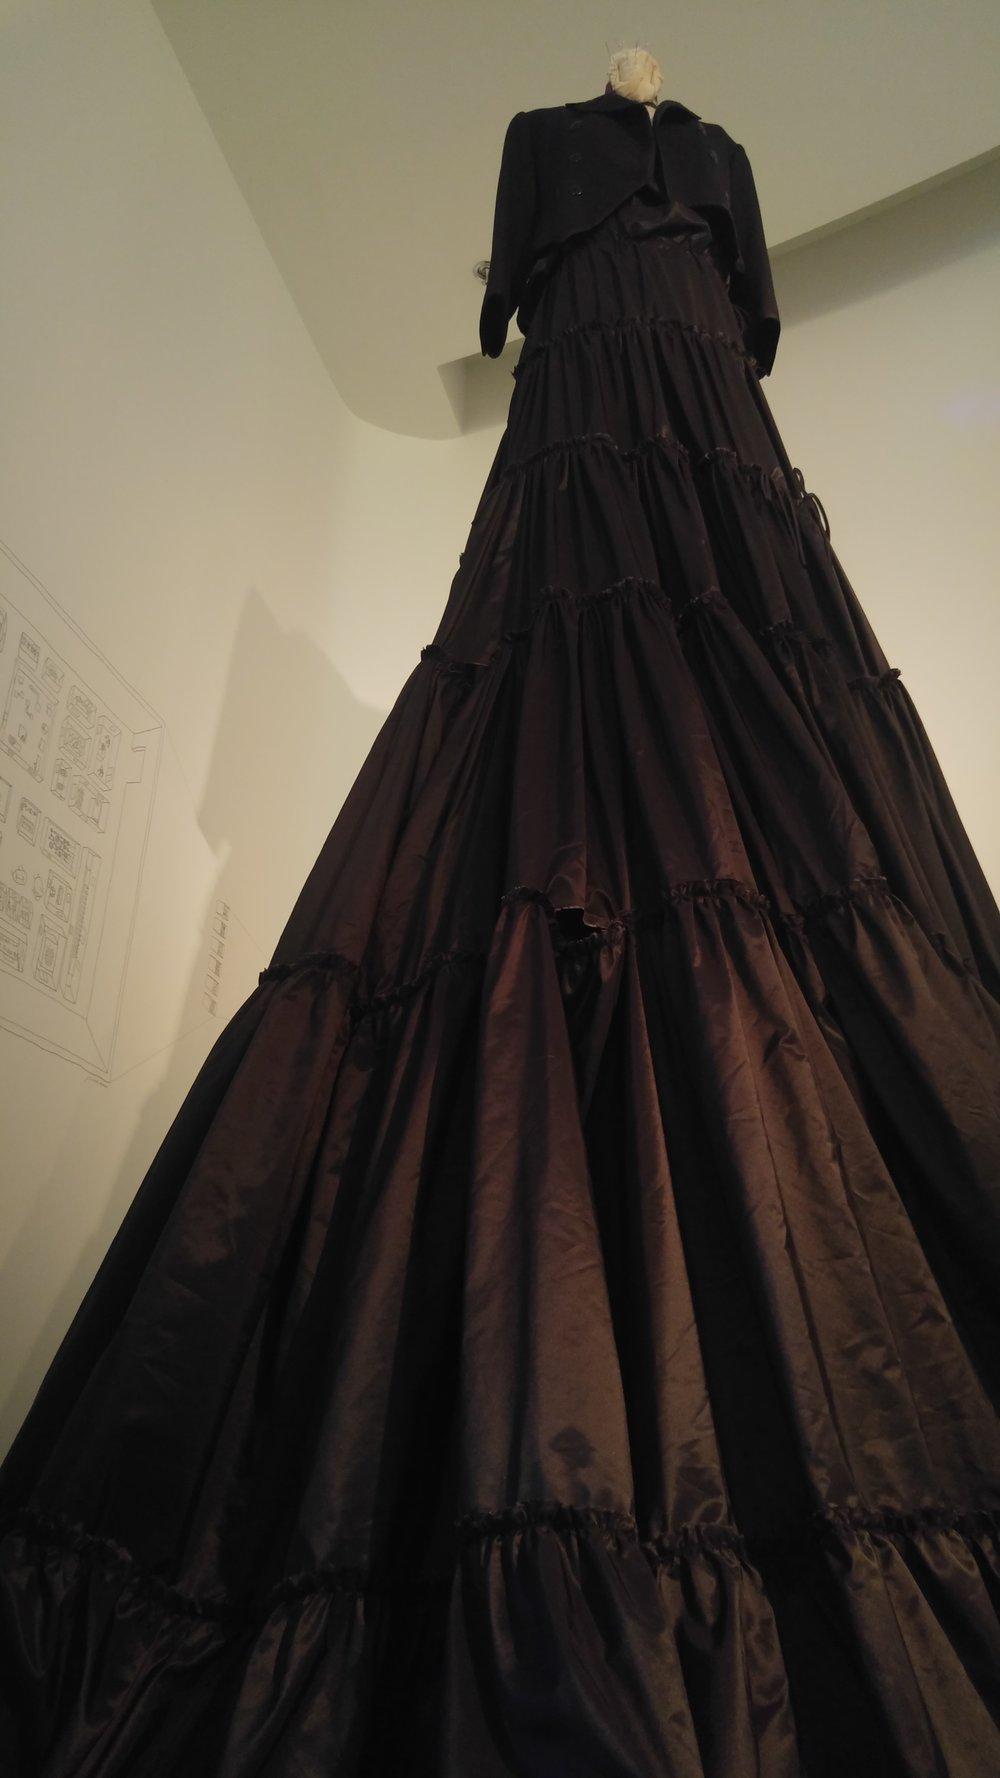 """pirat skirt"" Yaniv persy 2015-2017 nfinished design for a bespoke)"